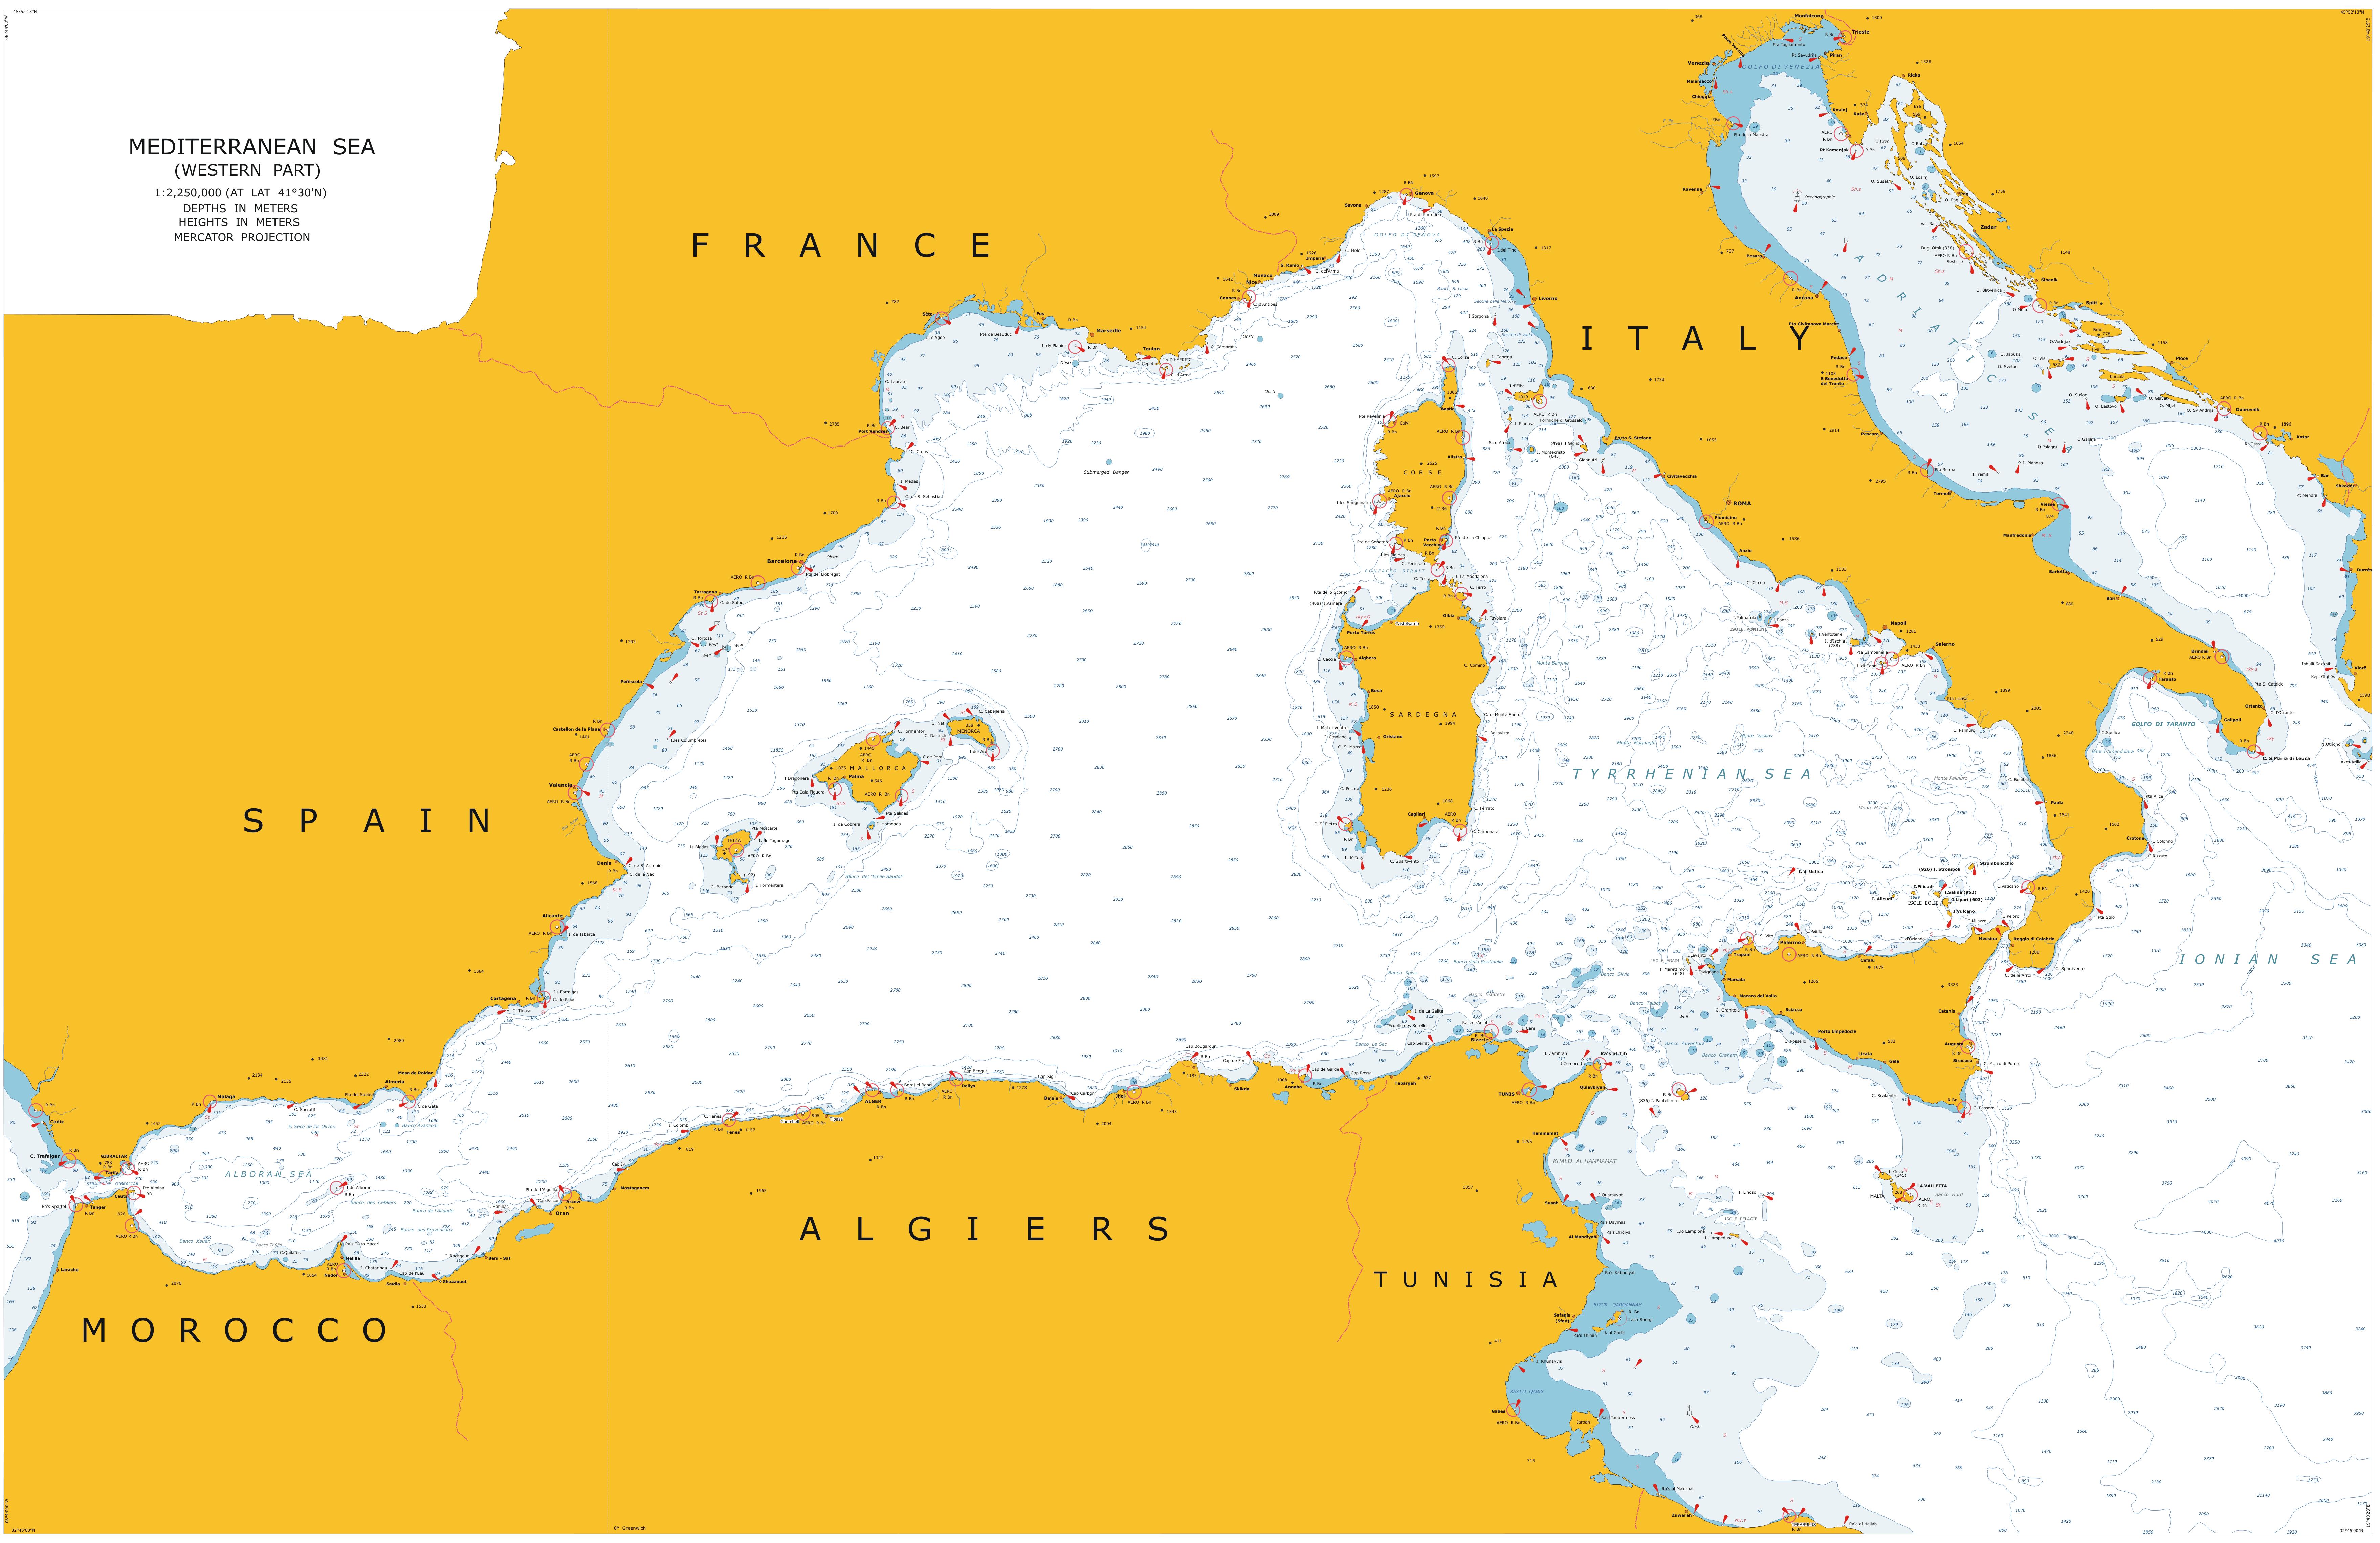 Mediterranean Sea Map World images